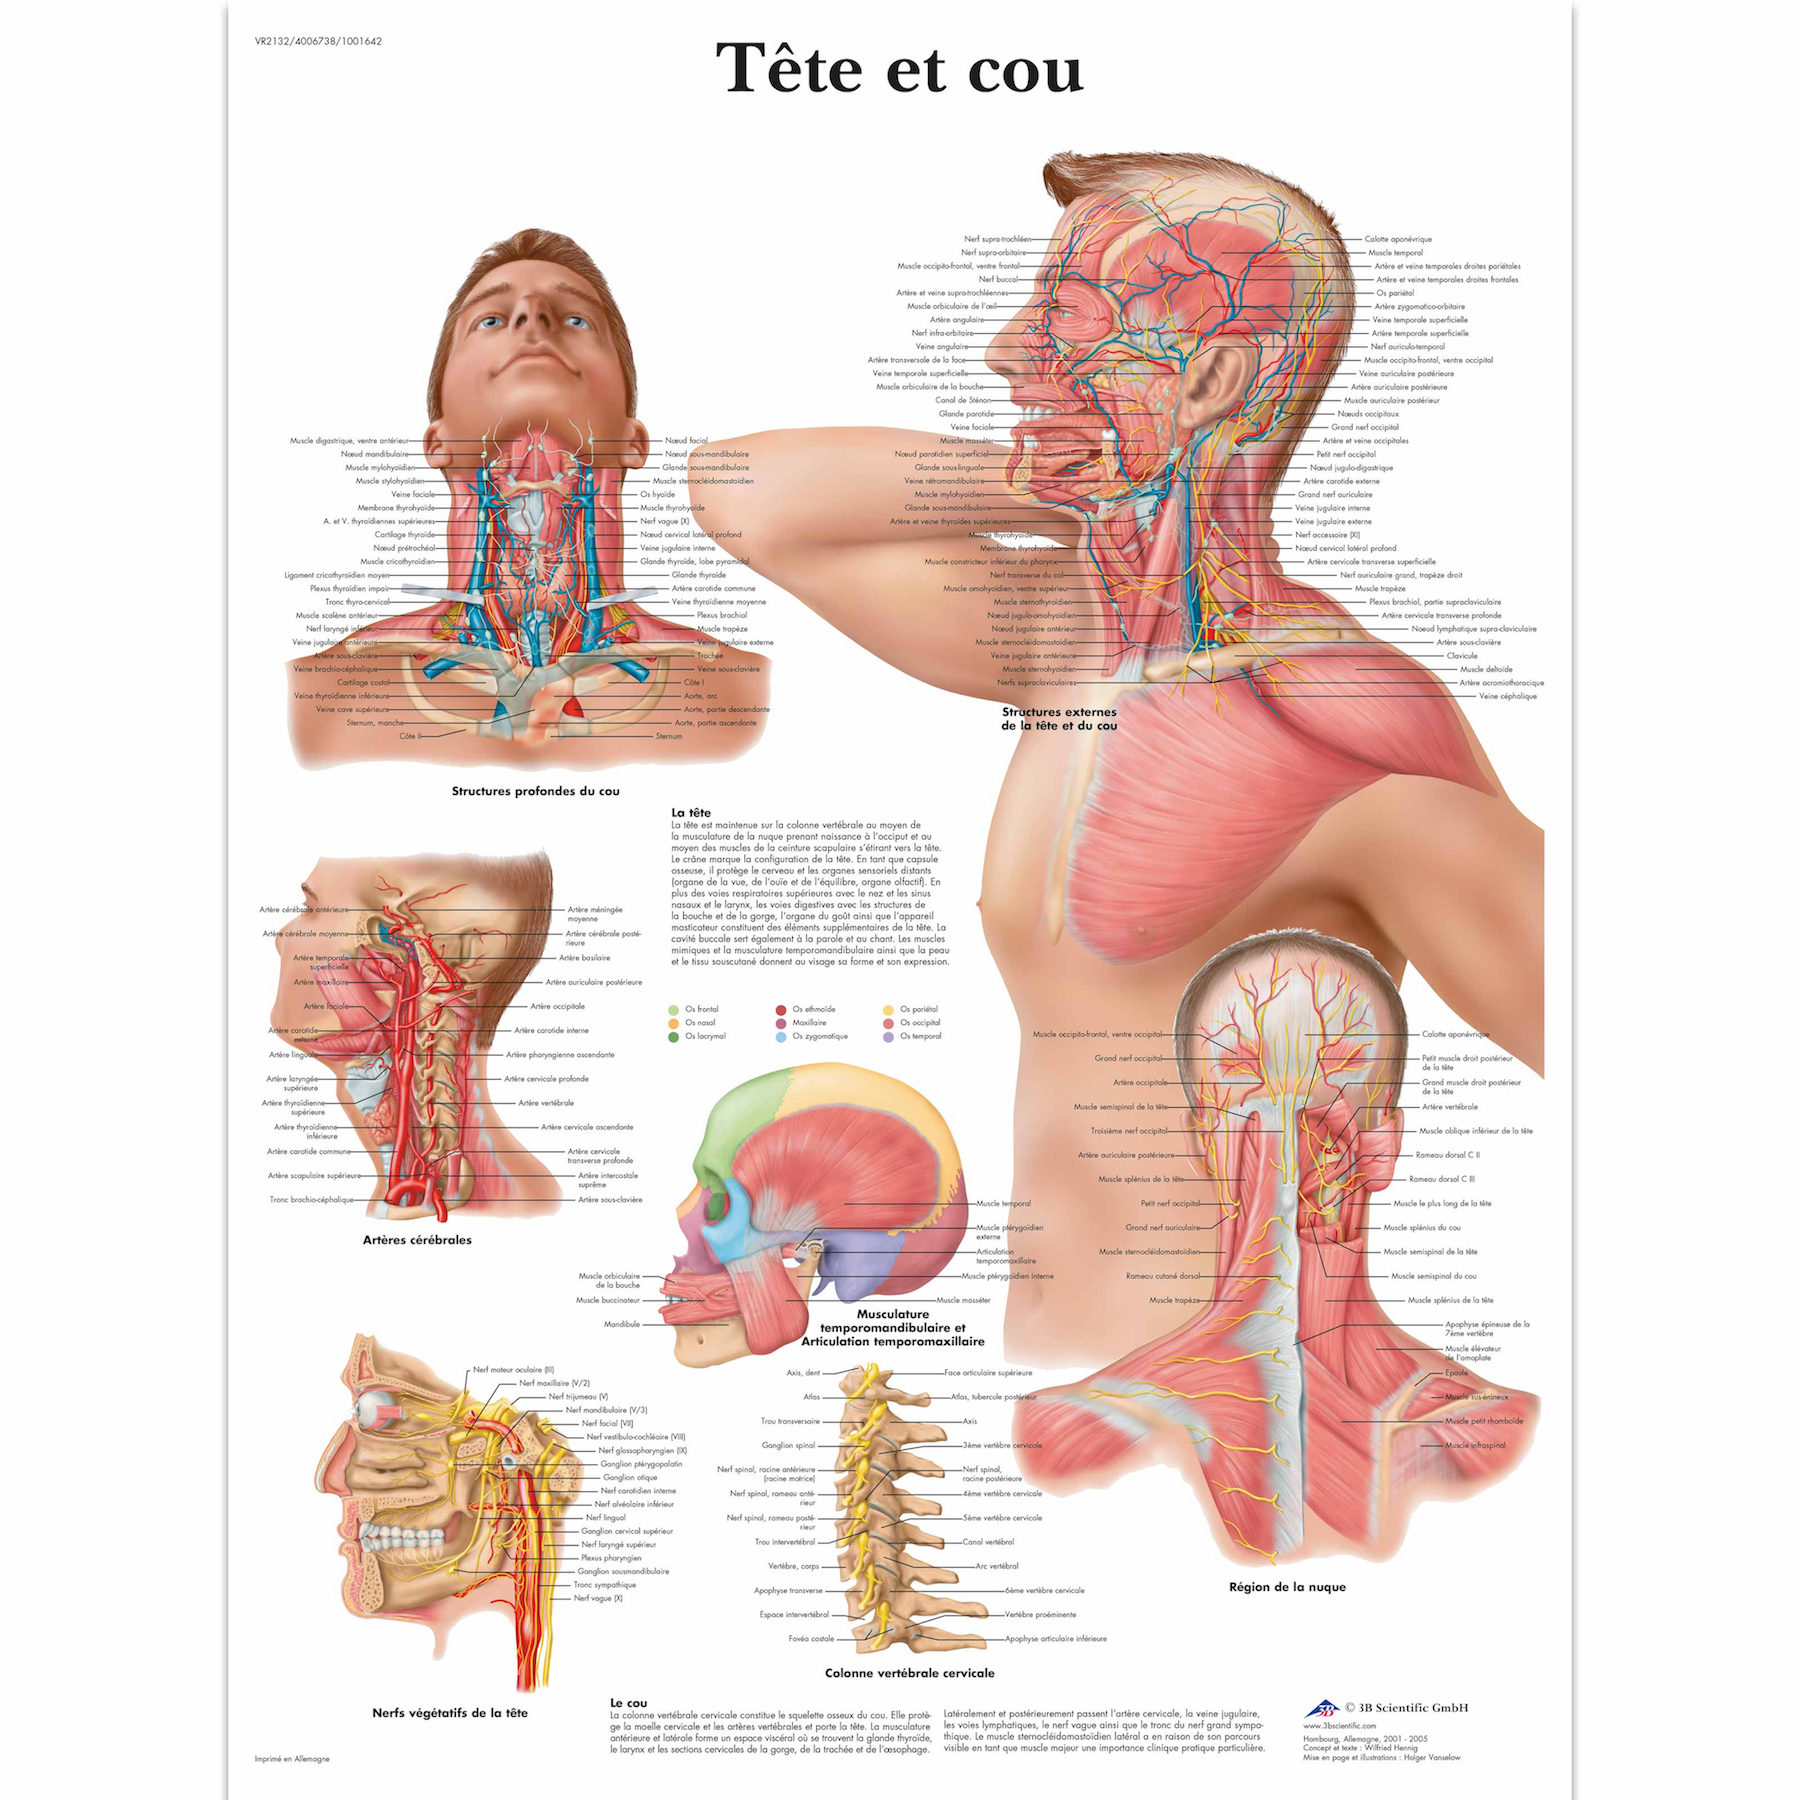 Anatomy Pathology Anatomical Human Body Part Head To Neck Classic